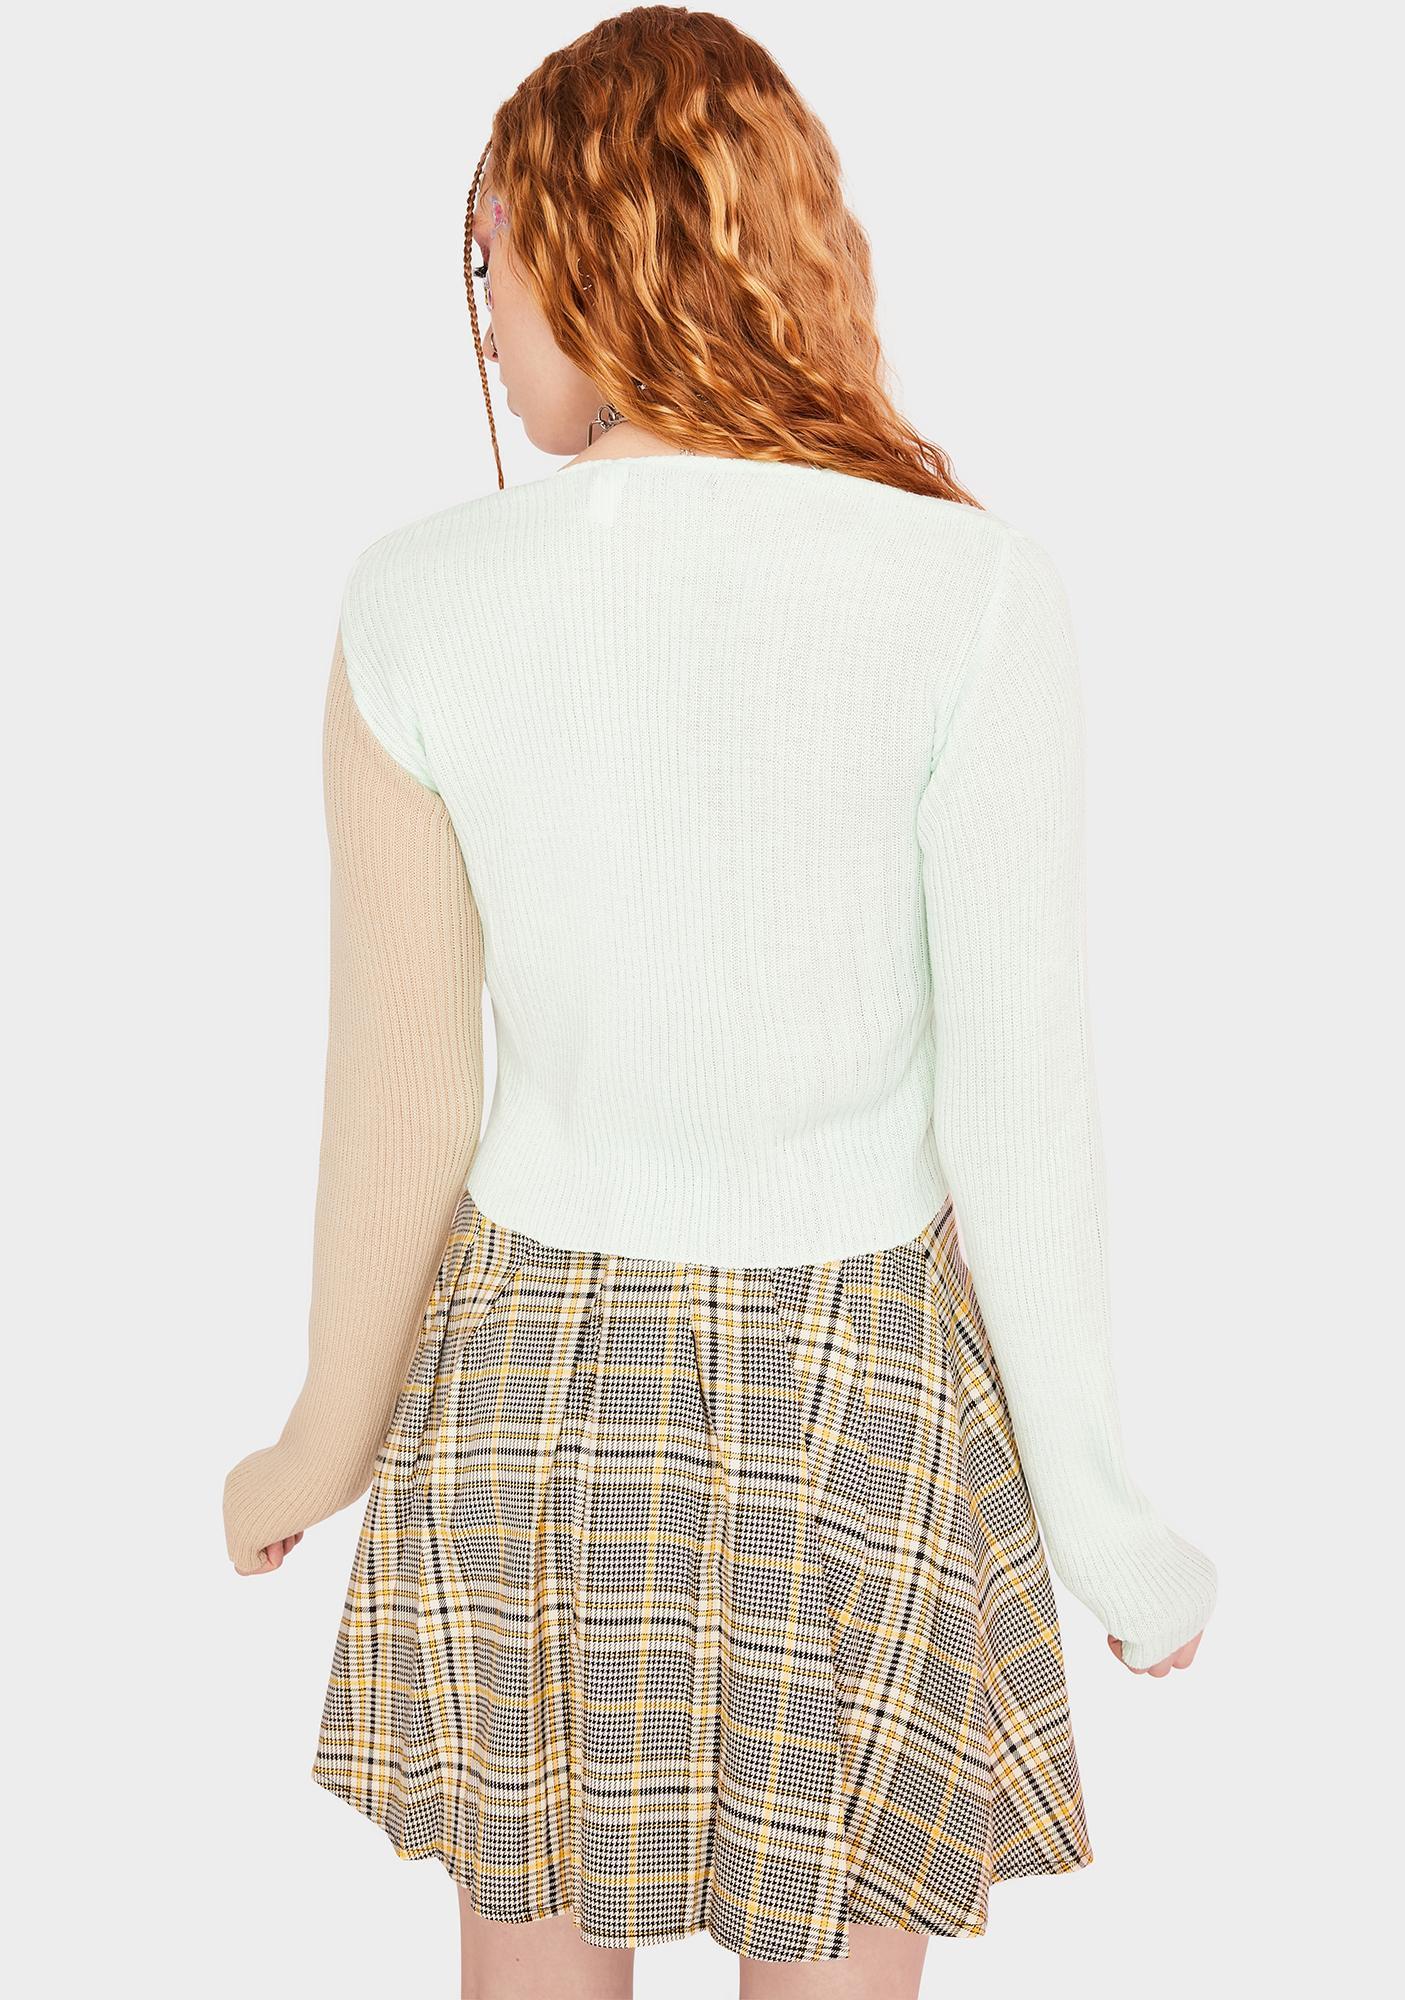 Daisy Street 90's Split Color Cropped Cardigan